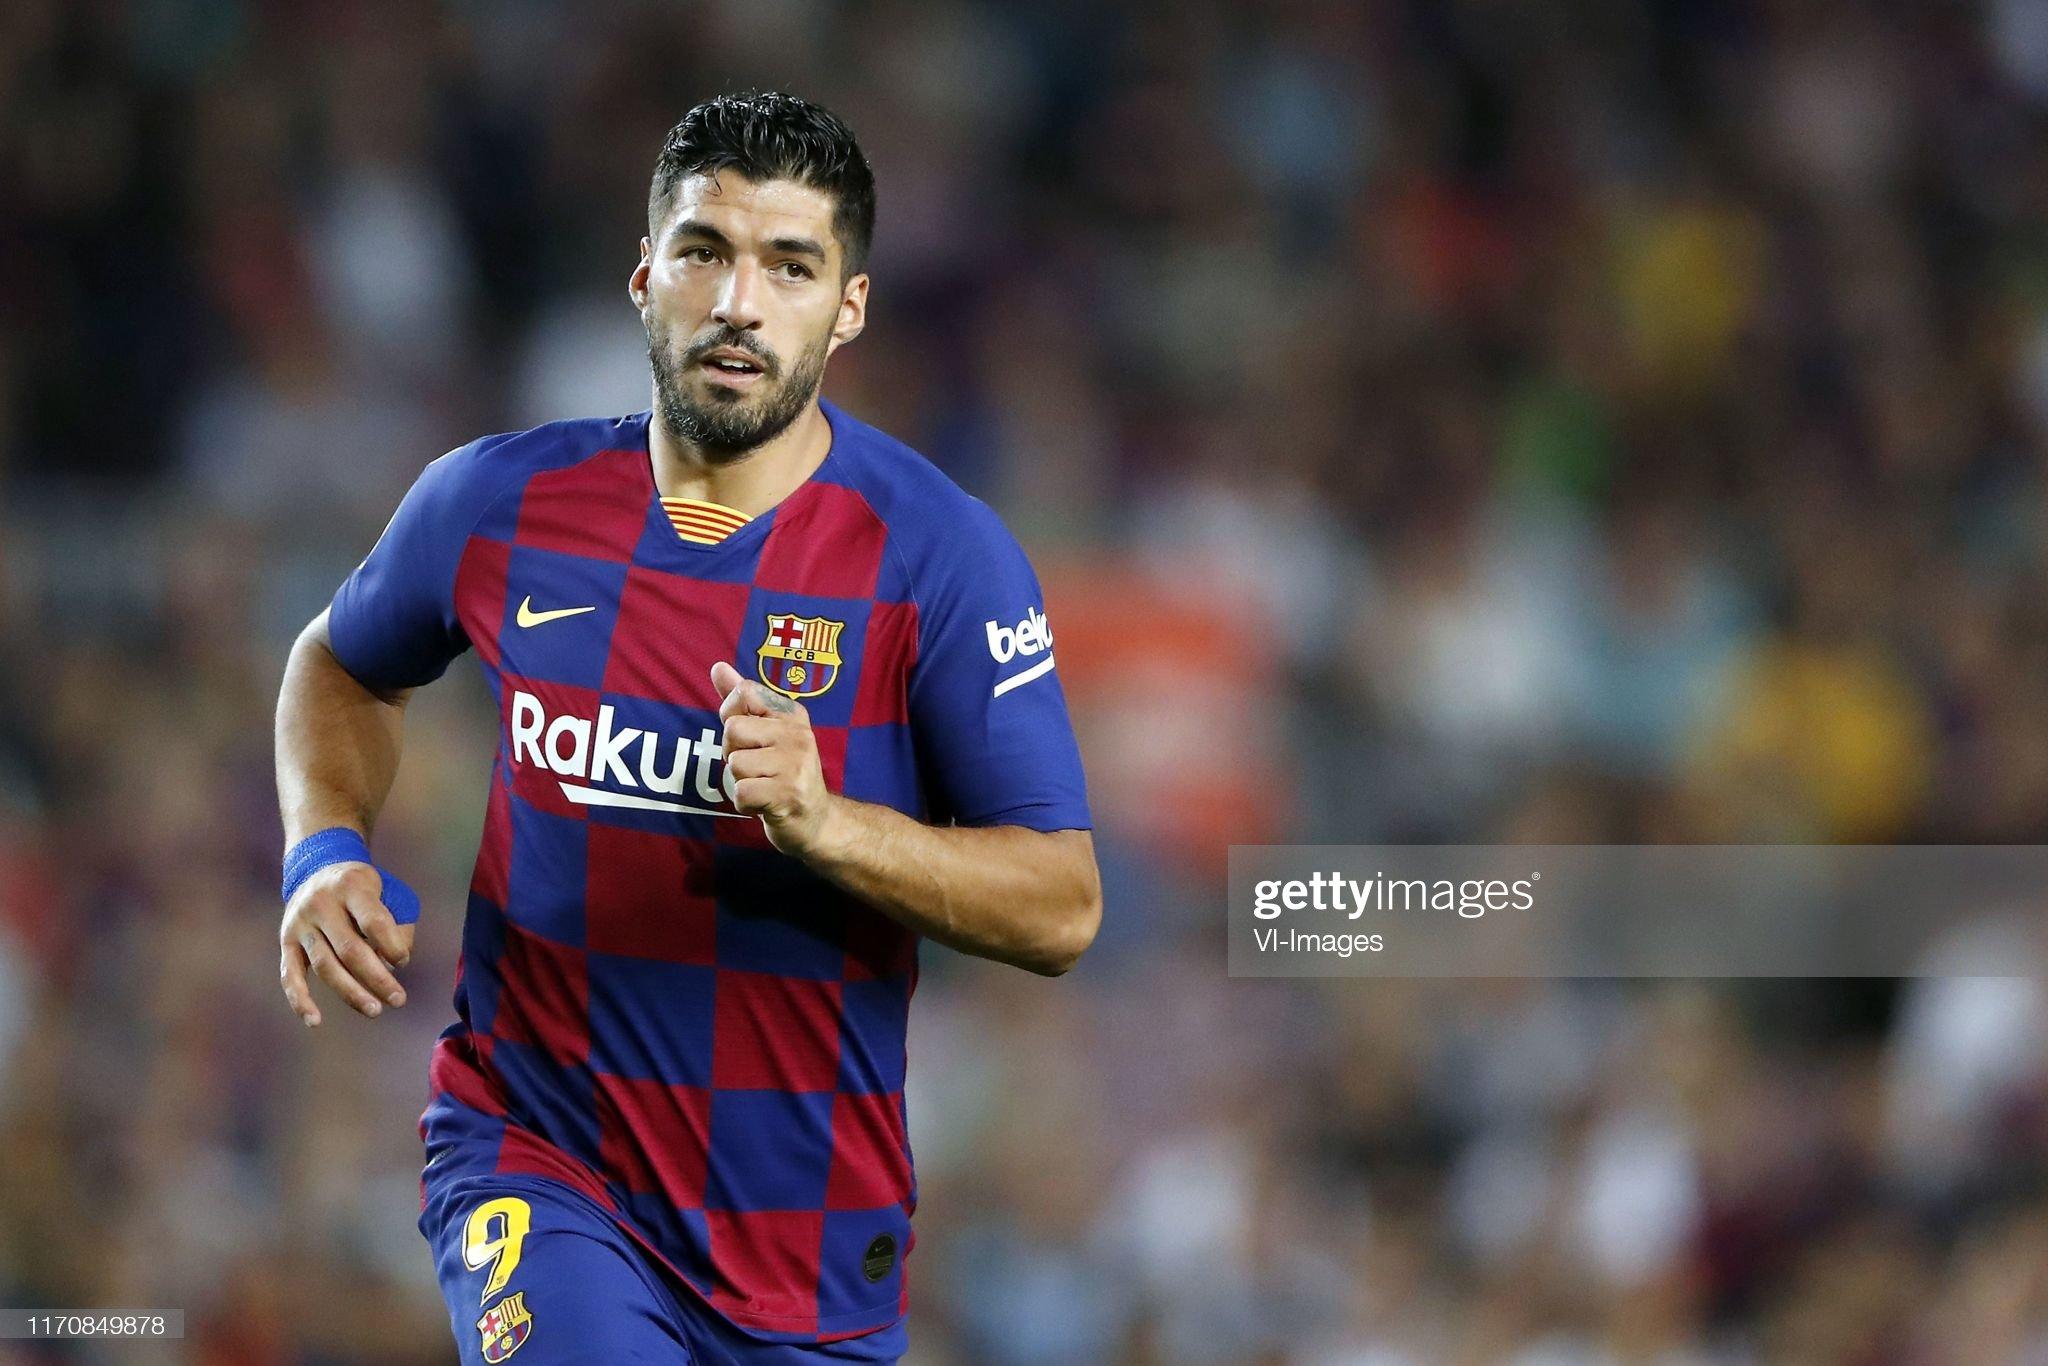 صور مباراة : برشلونة - فياريال 2-1 ( 24-09-2019 )  Luis-suarez-of-fc-barcelona-during-the-laliga-santander-match-between-picture-id1170849878?s=2048x2048